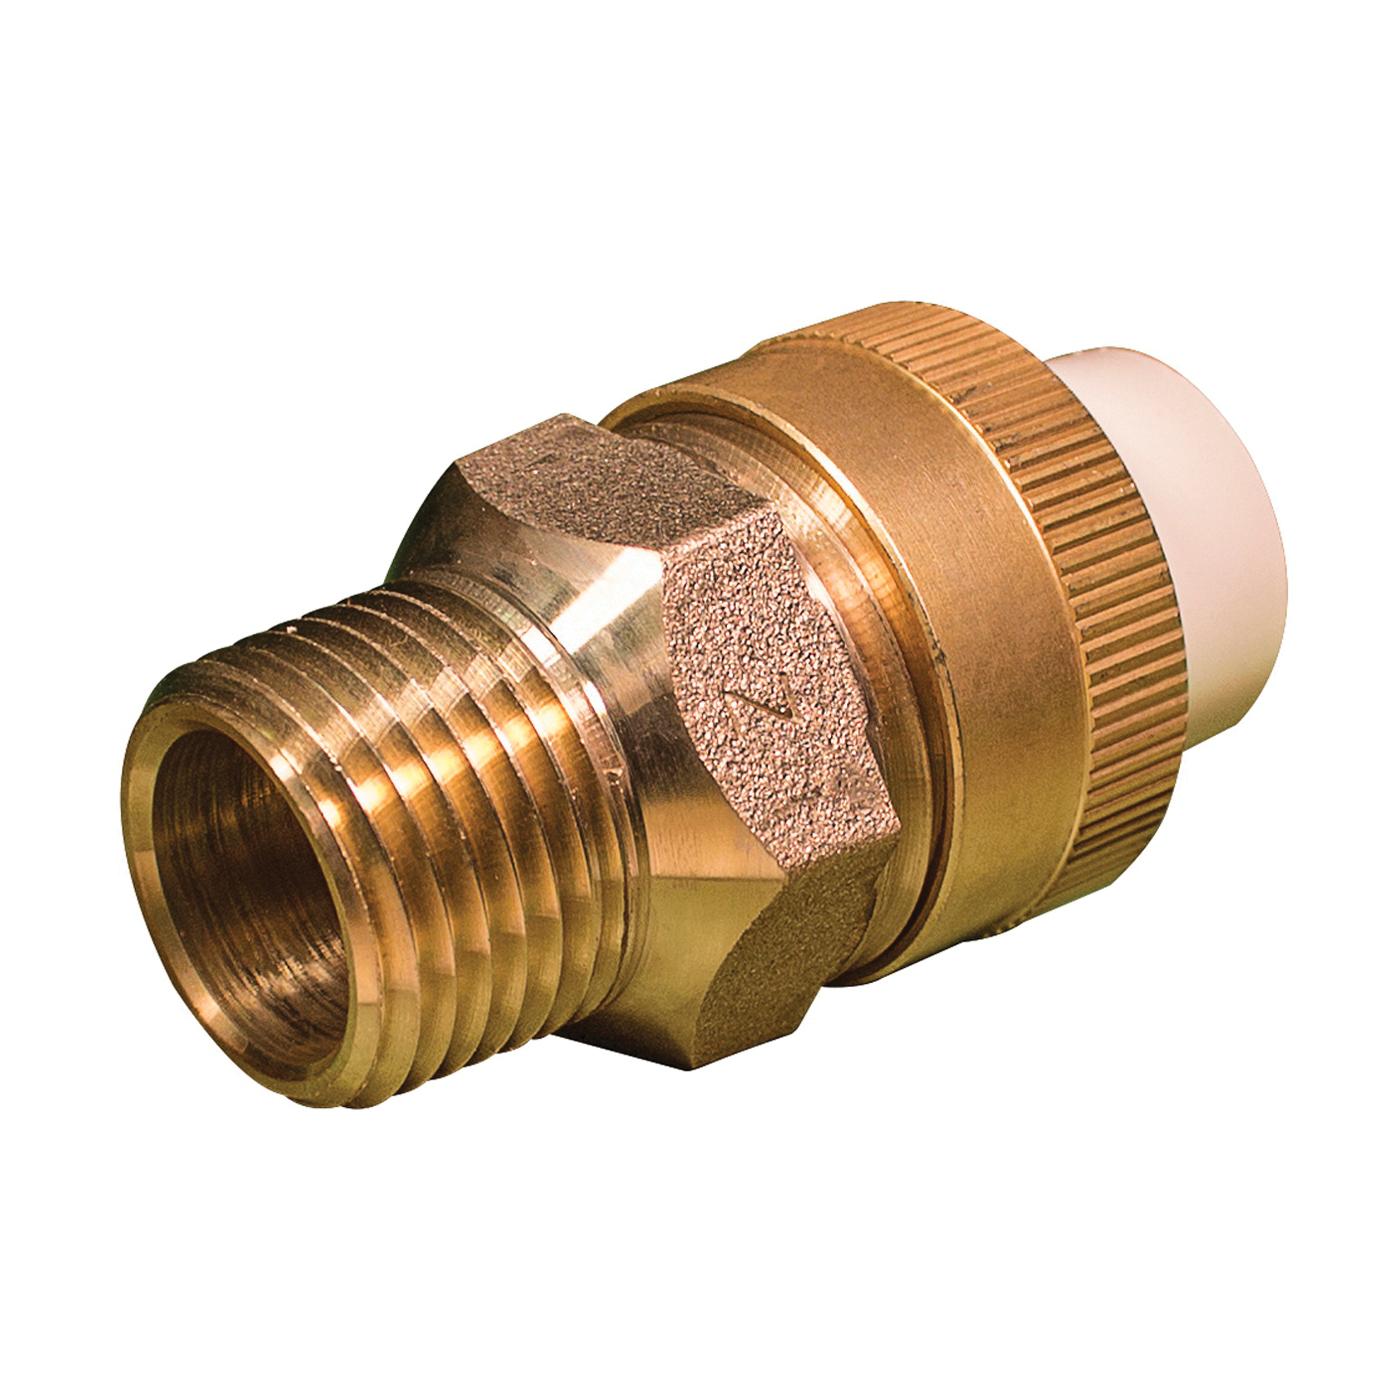 Picture of GENOVA 53374Z/TUM-0500 Transition Union, 1/2 in, Slip Joint x MIP, 100 psi Pressure